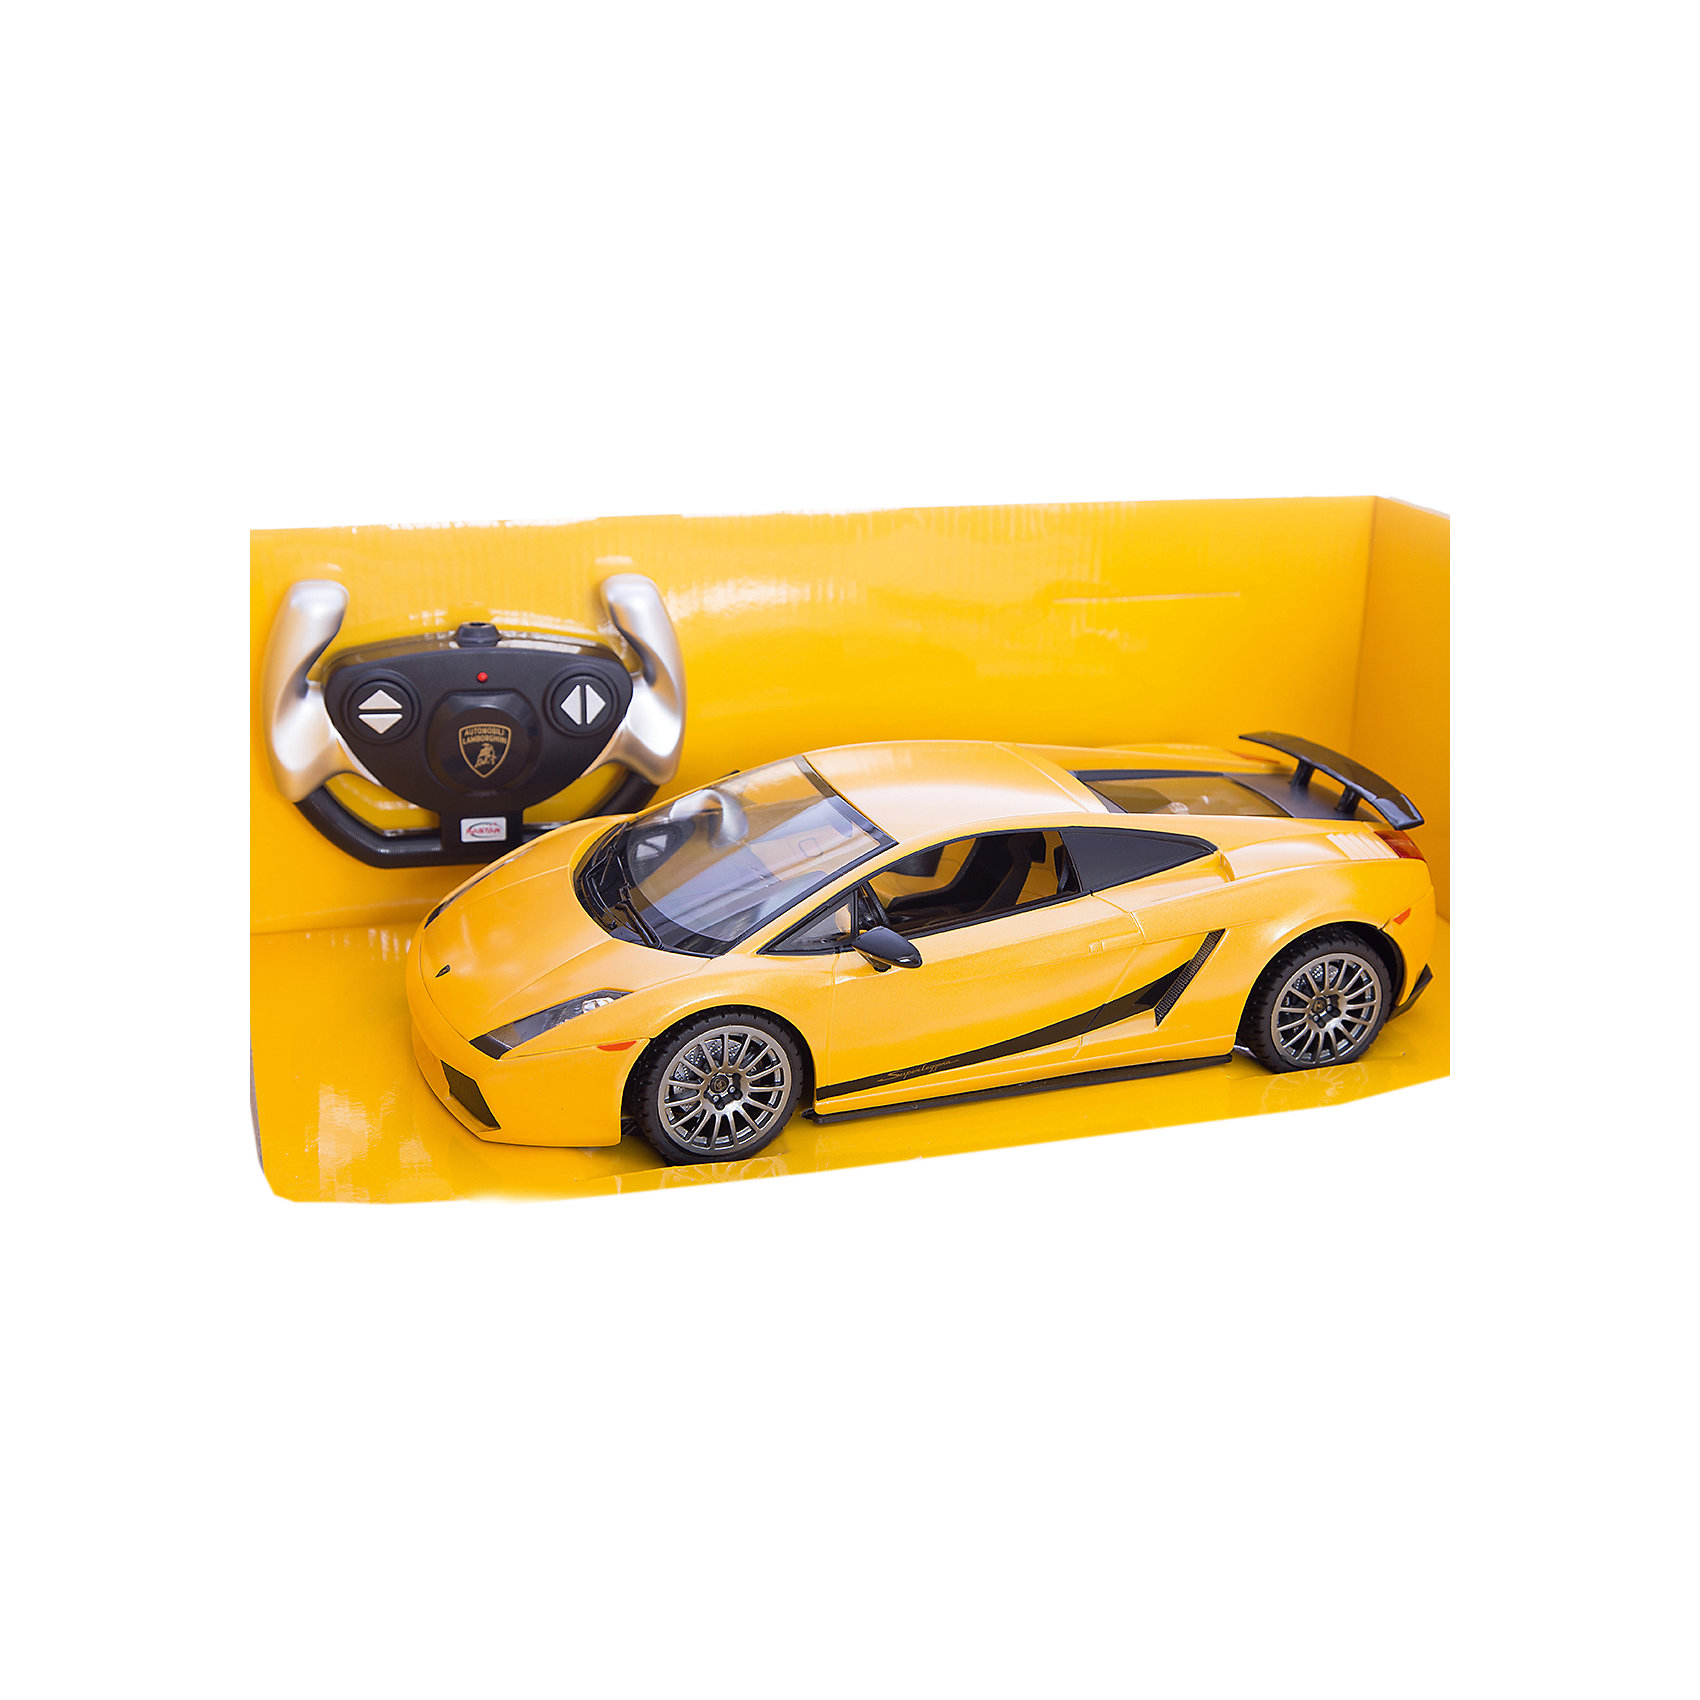 - RASTAR Радиоуправляемая машина Lamborghini 1:14, желтая nikko машина радиоуправляемая bumblebee streetcar